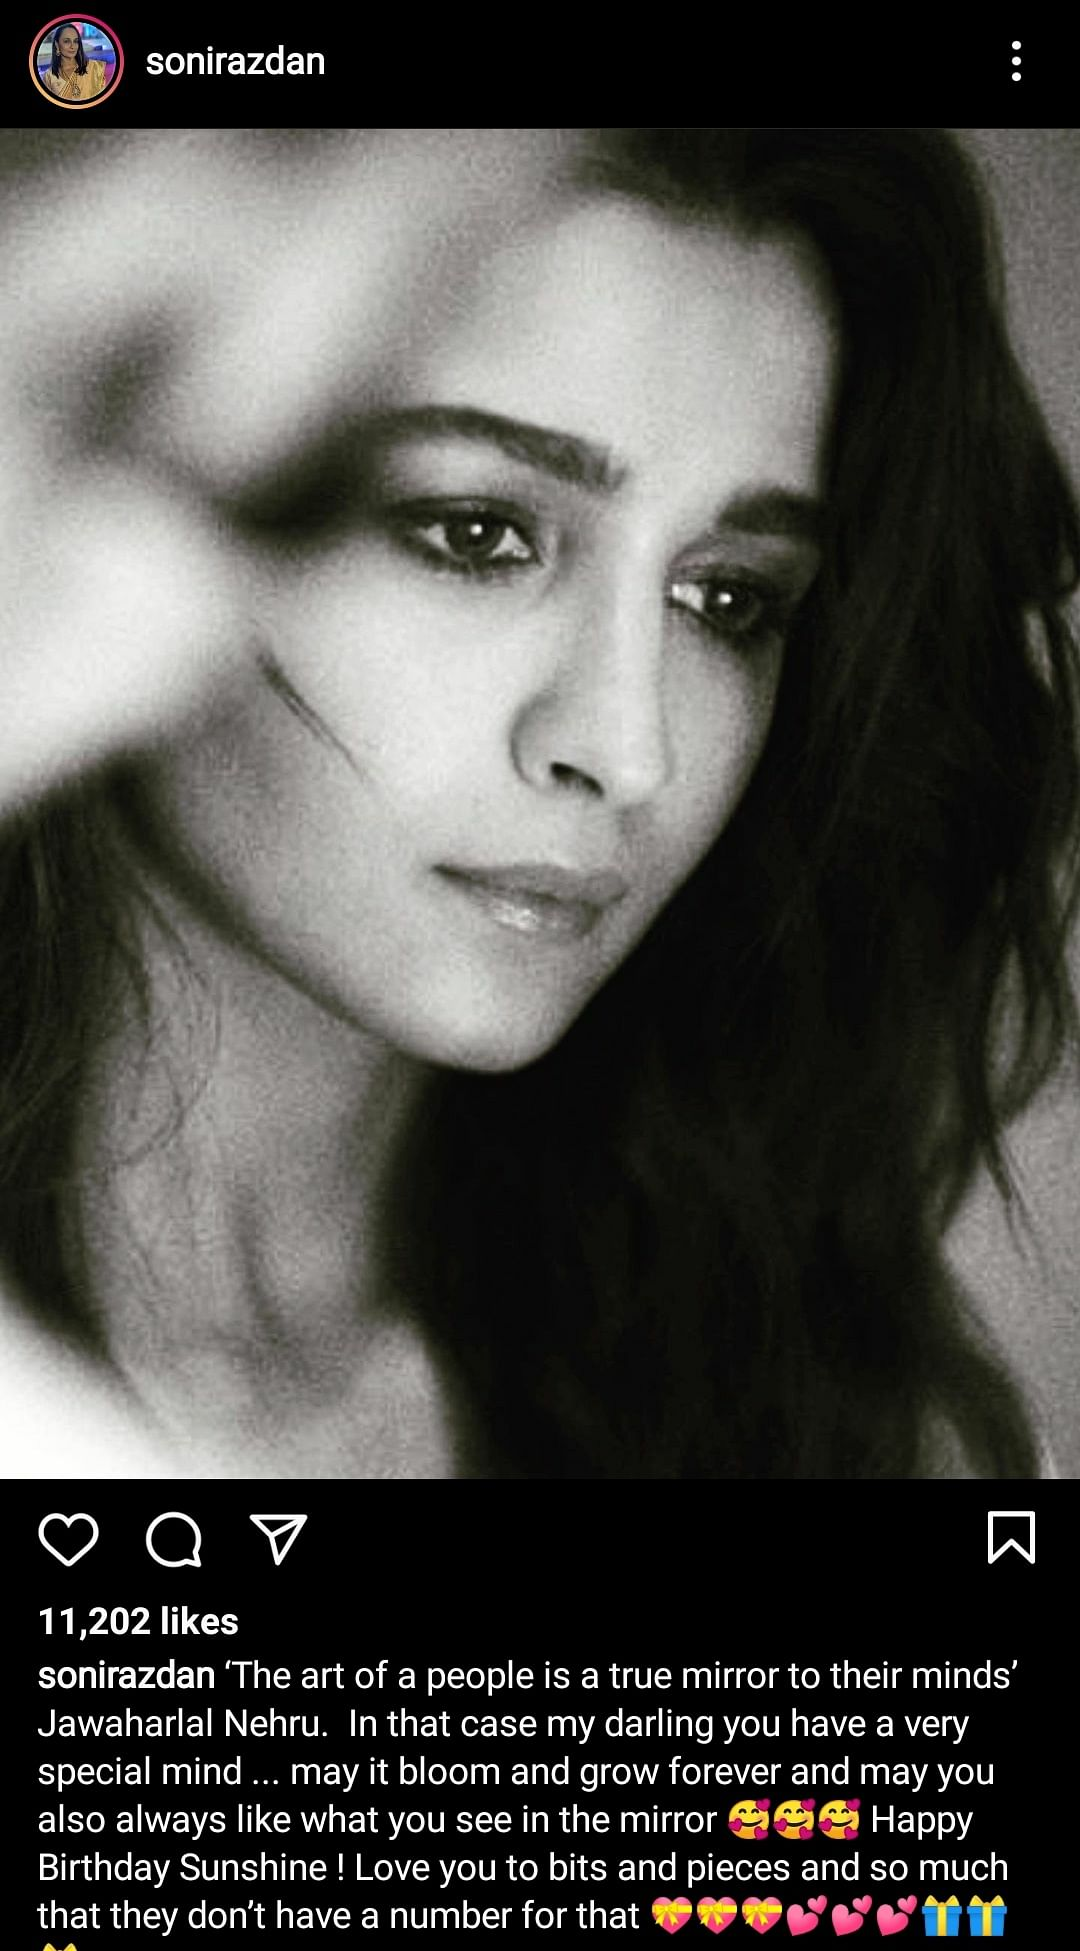 Riddhima, Soni, Kareena, and Other Celebs Wish Alia Bhatt on B'Day